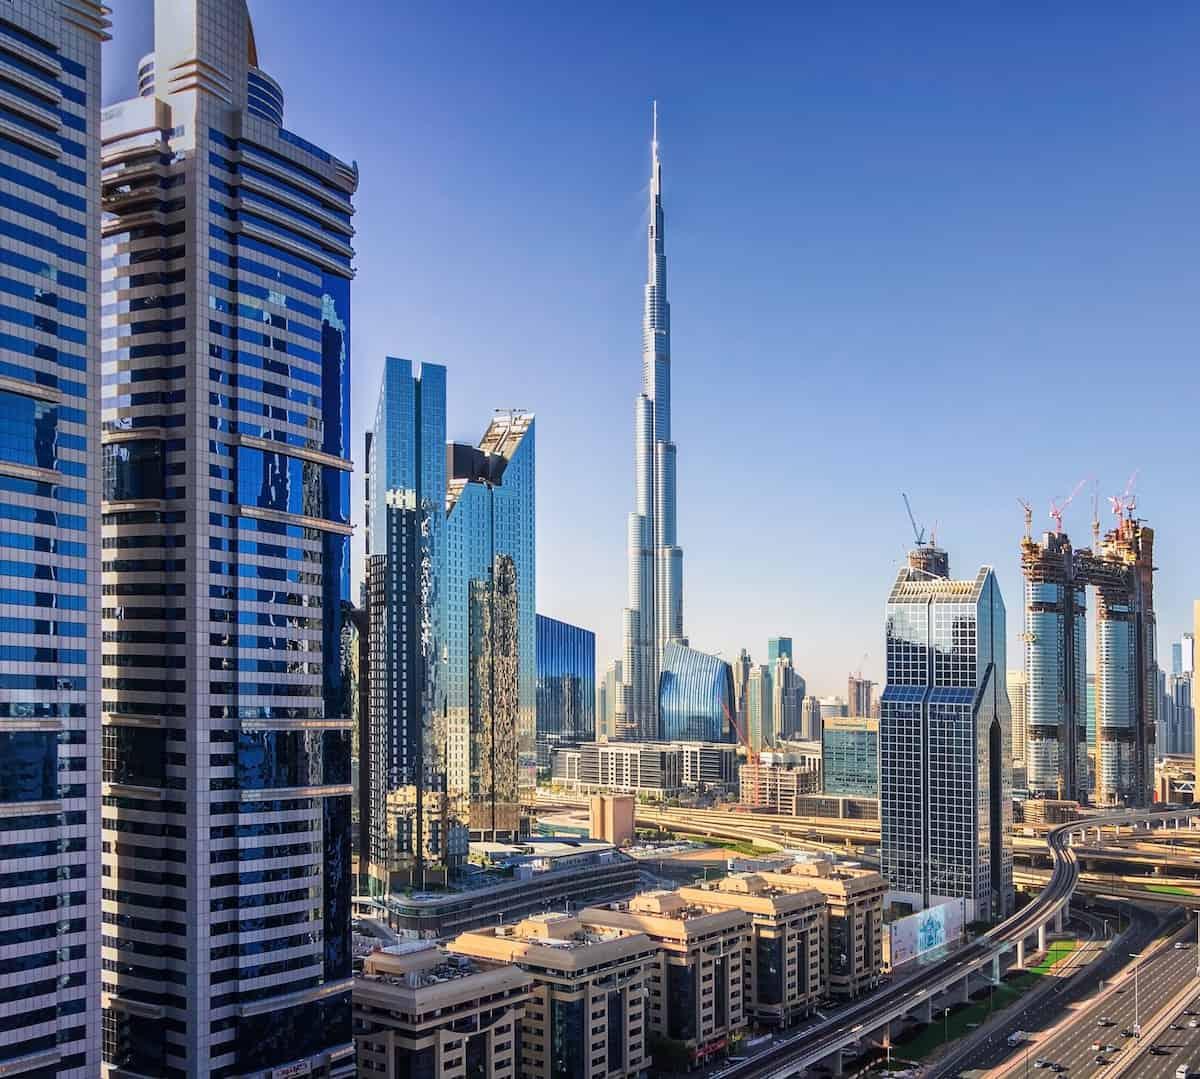 UAE's Largest Real Estate Firm Emaar Launches New Token Developed on JPMorgan's DLT Platform Quorum